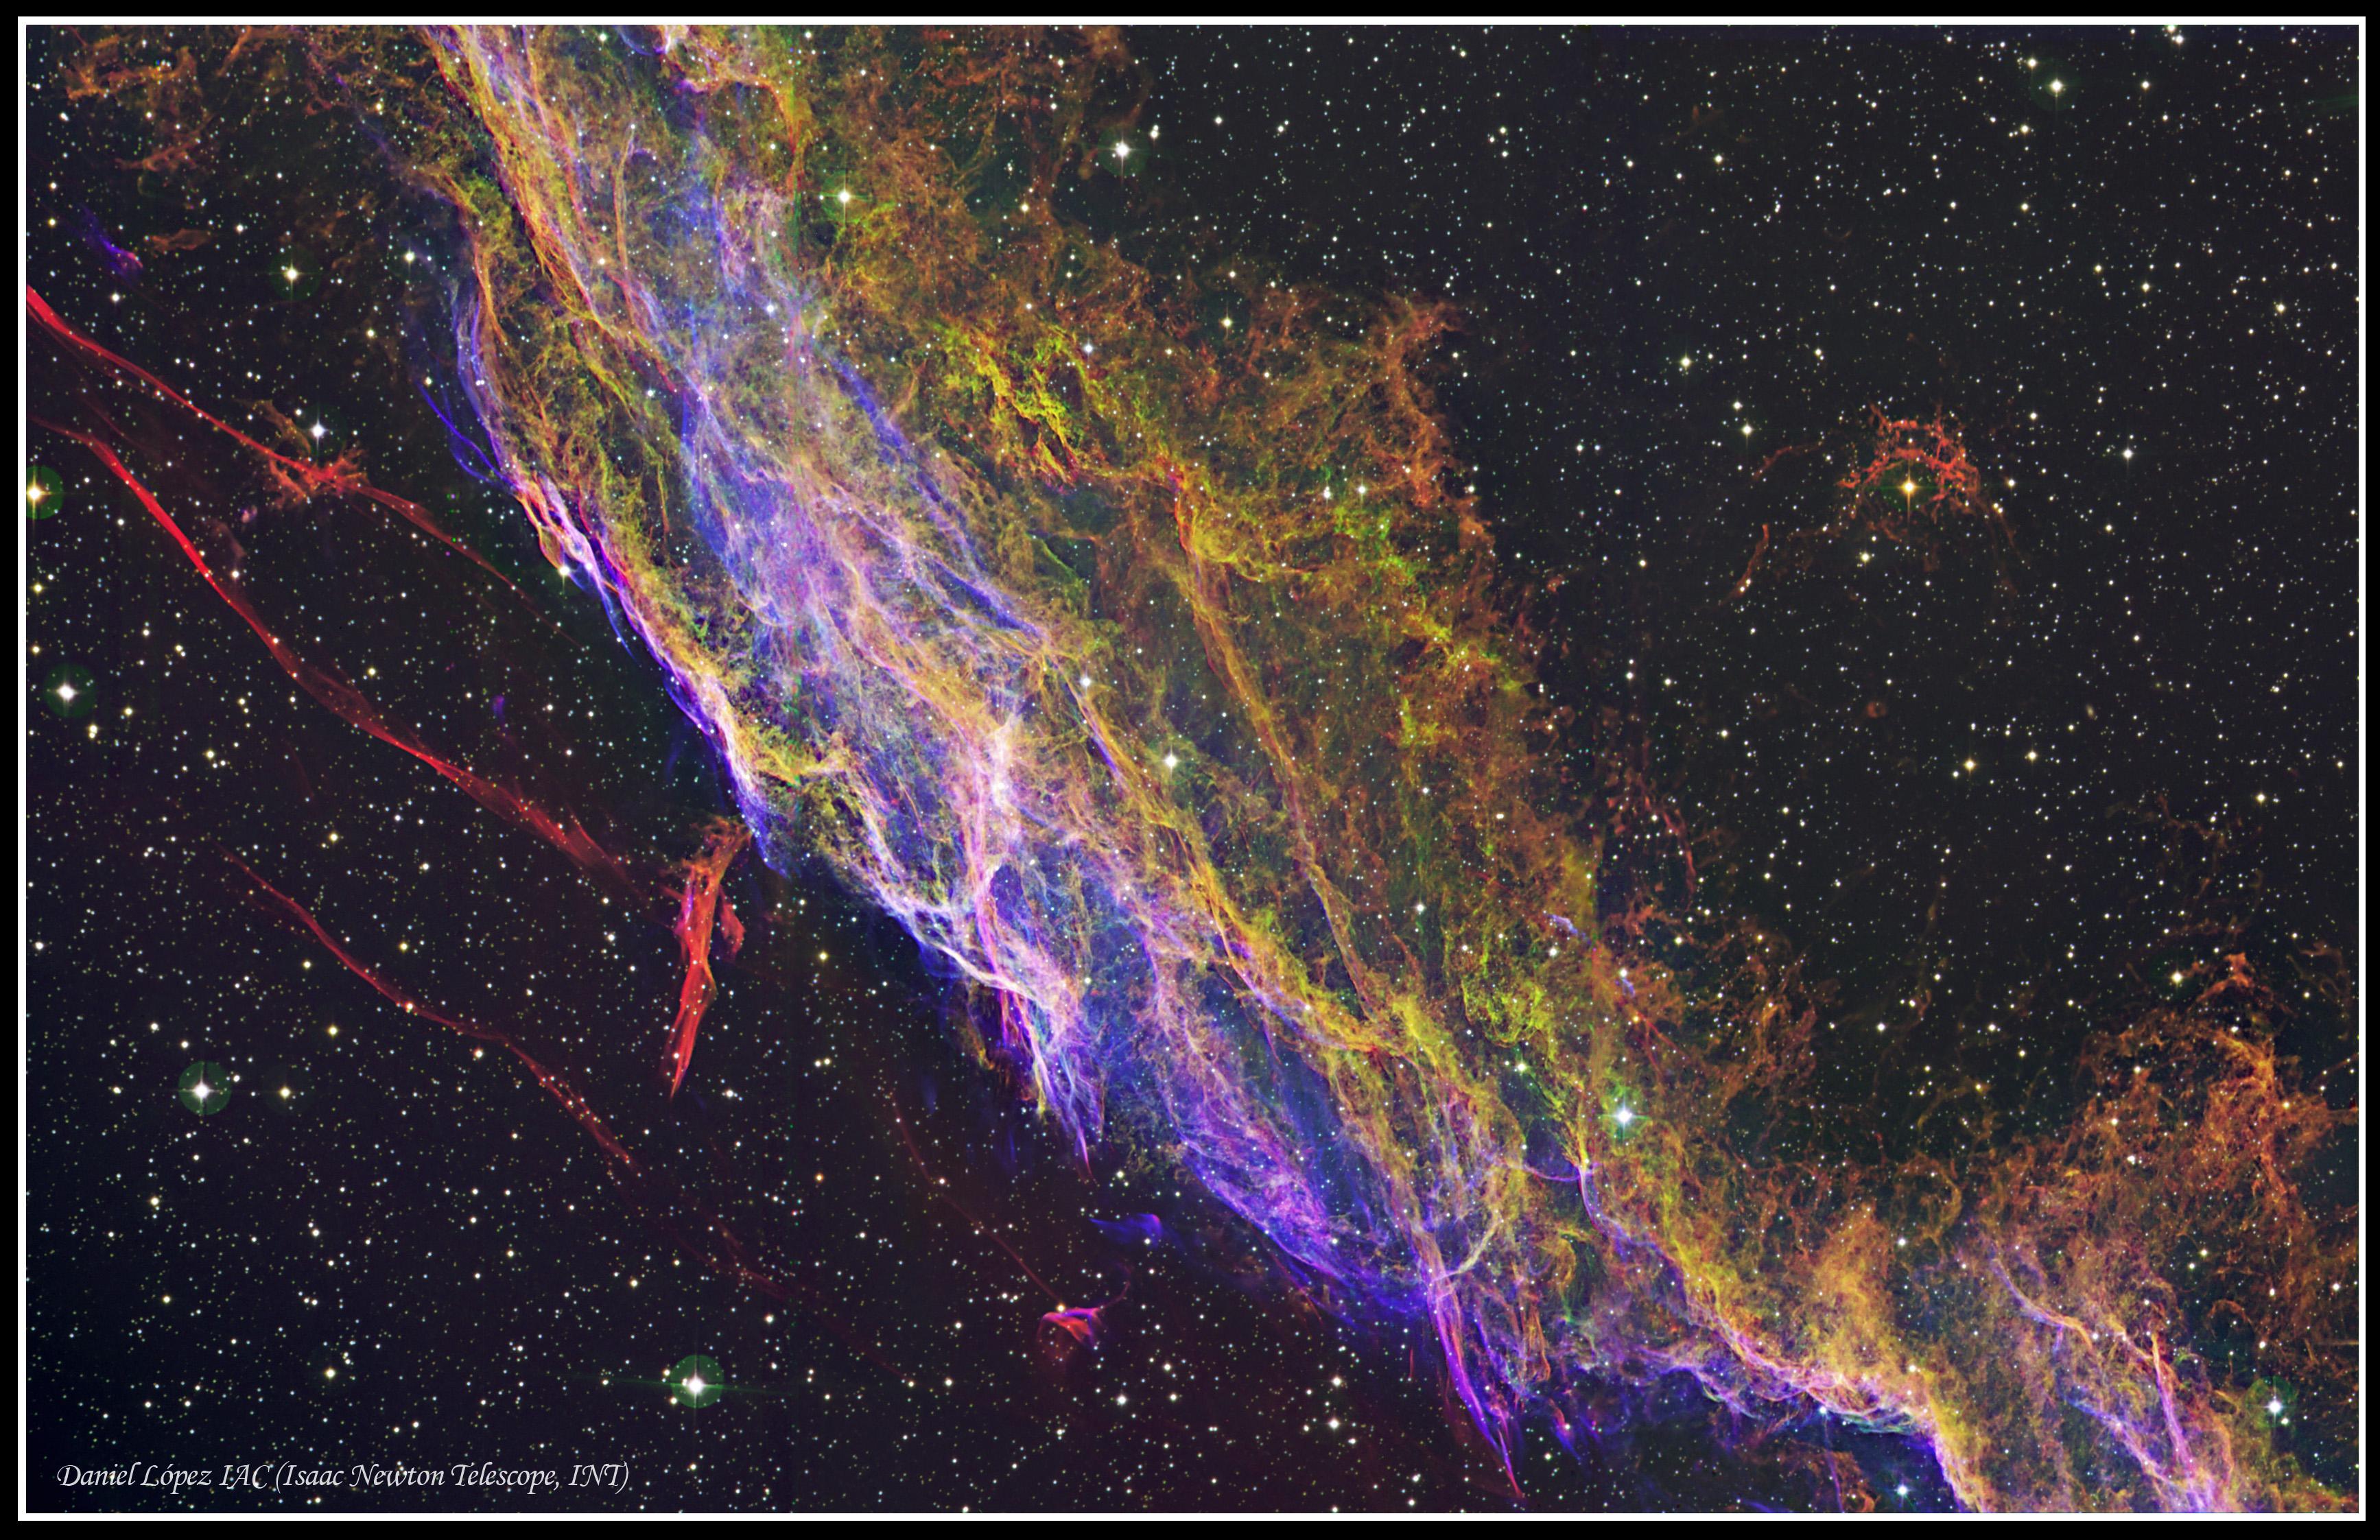 http://antwrp.gsfc.nasa.gov/apod/image/0912/filaments_iac_big.jpg